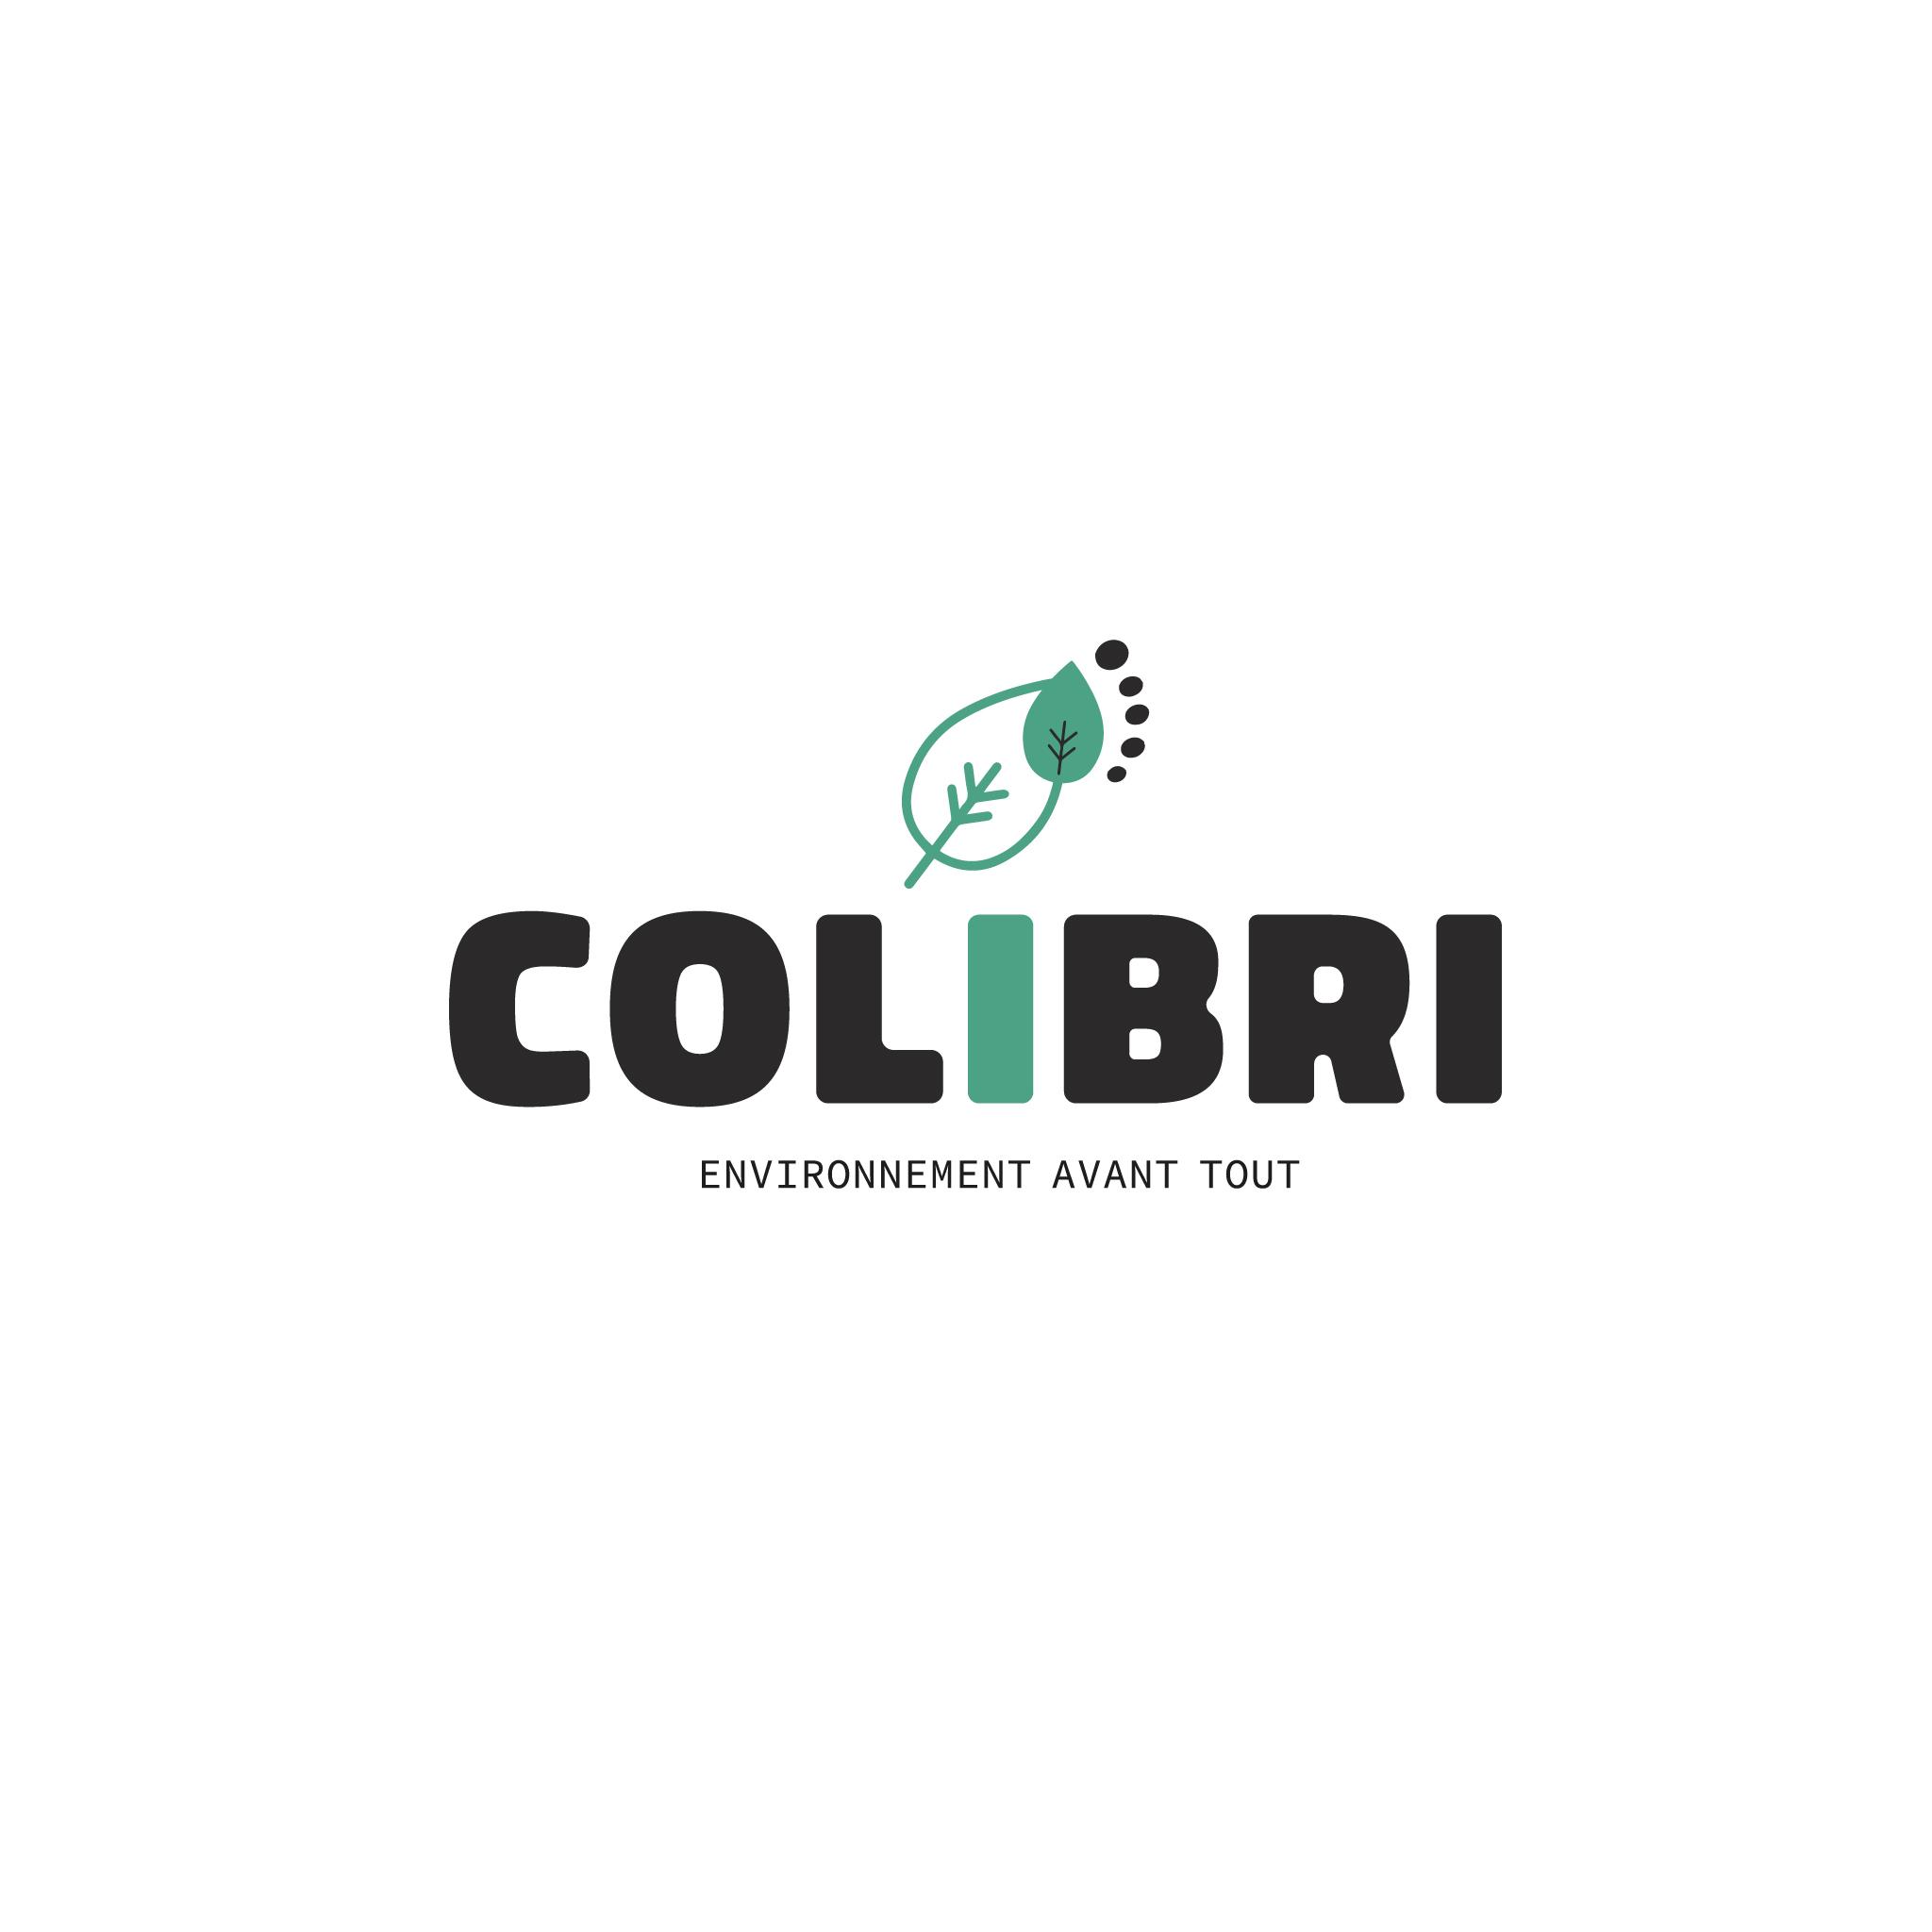 LOGO3-CONCEPT-COLIBRI-PROPO-LWAS